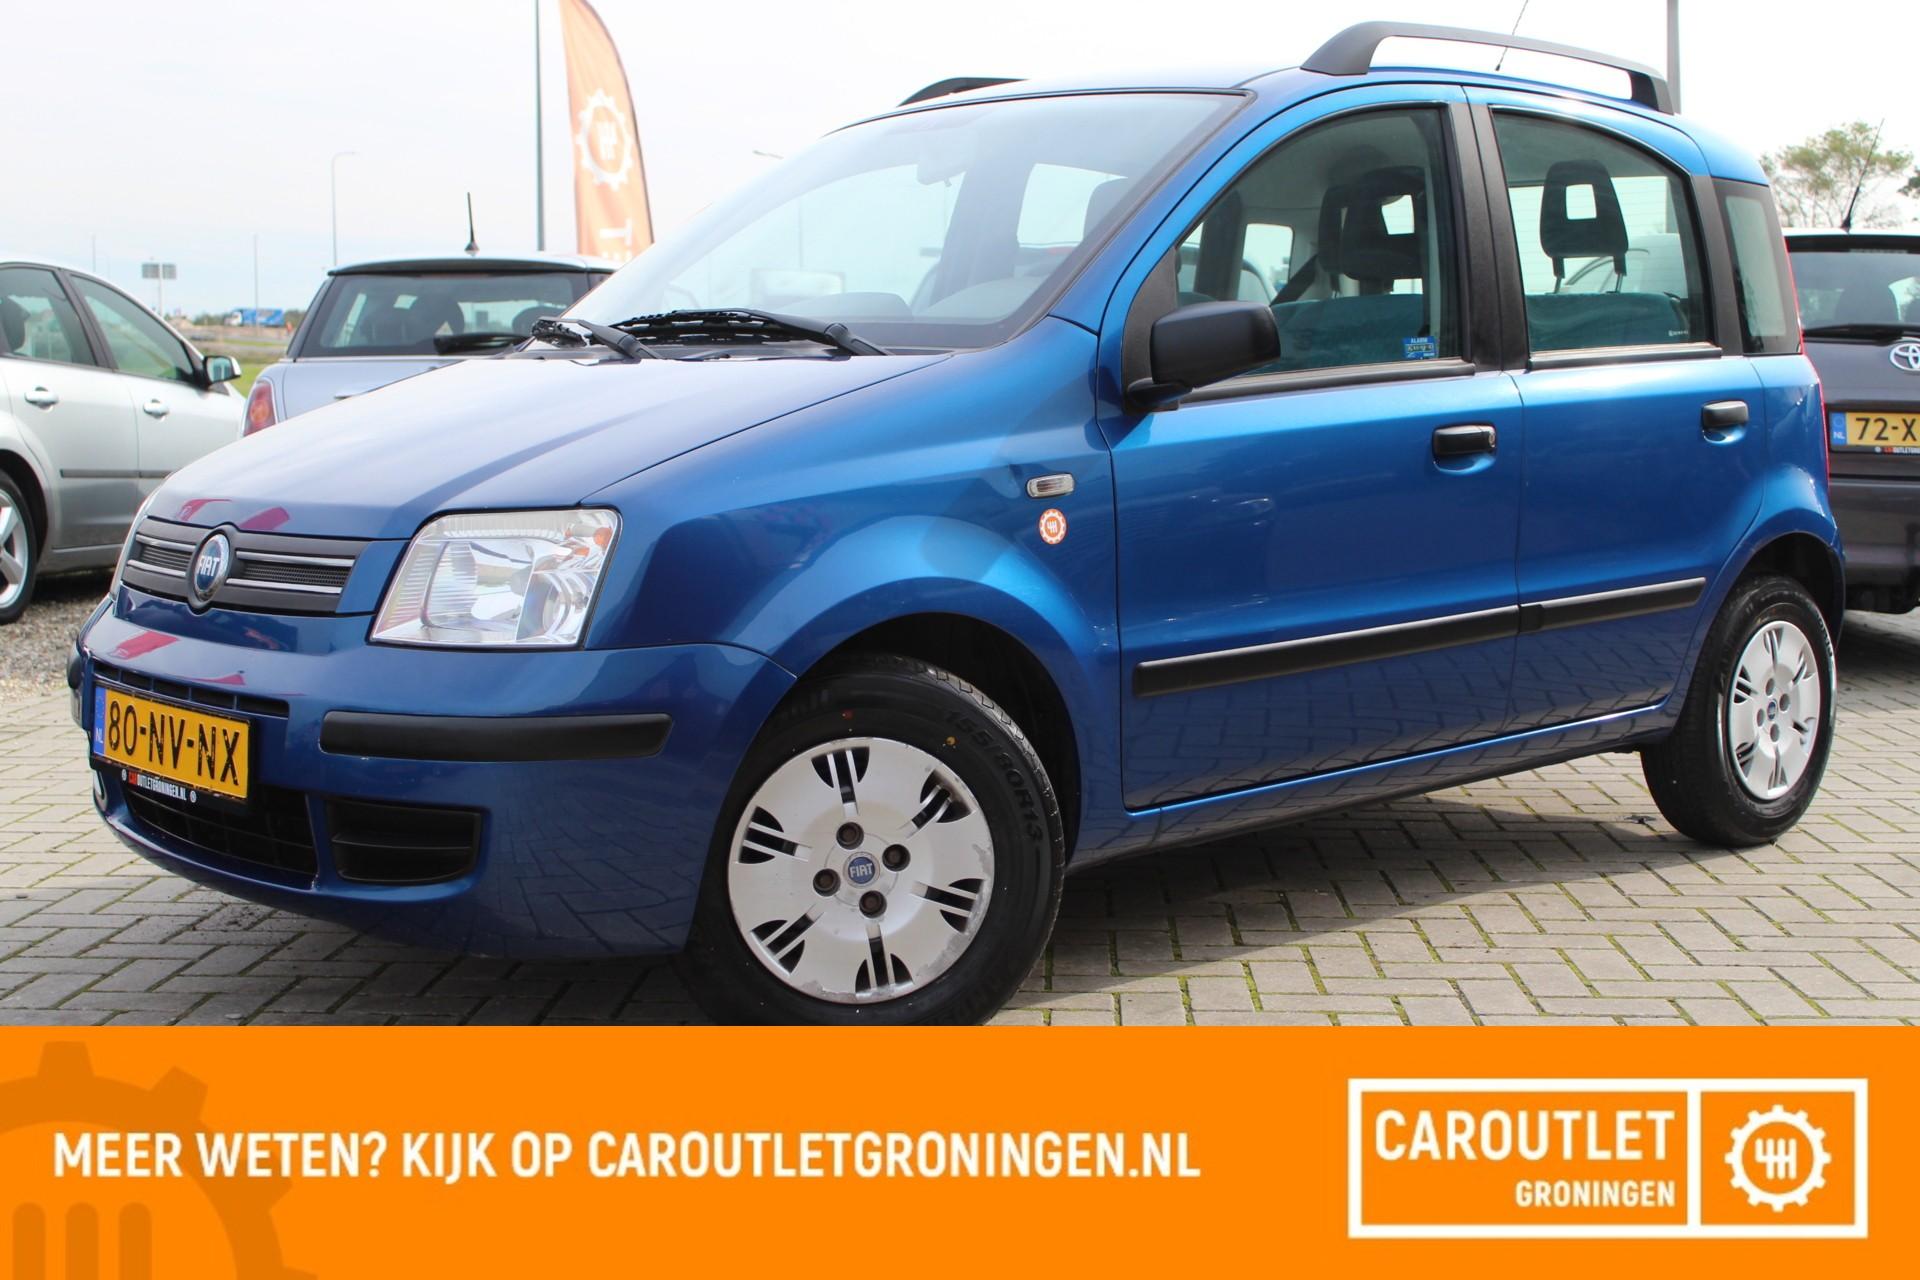 Caroutlet Groningen - Fiat Panda 1.2 Dynamic   ELEK PAKKET   NW APK   5 DEURS